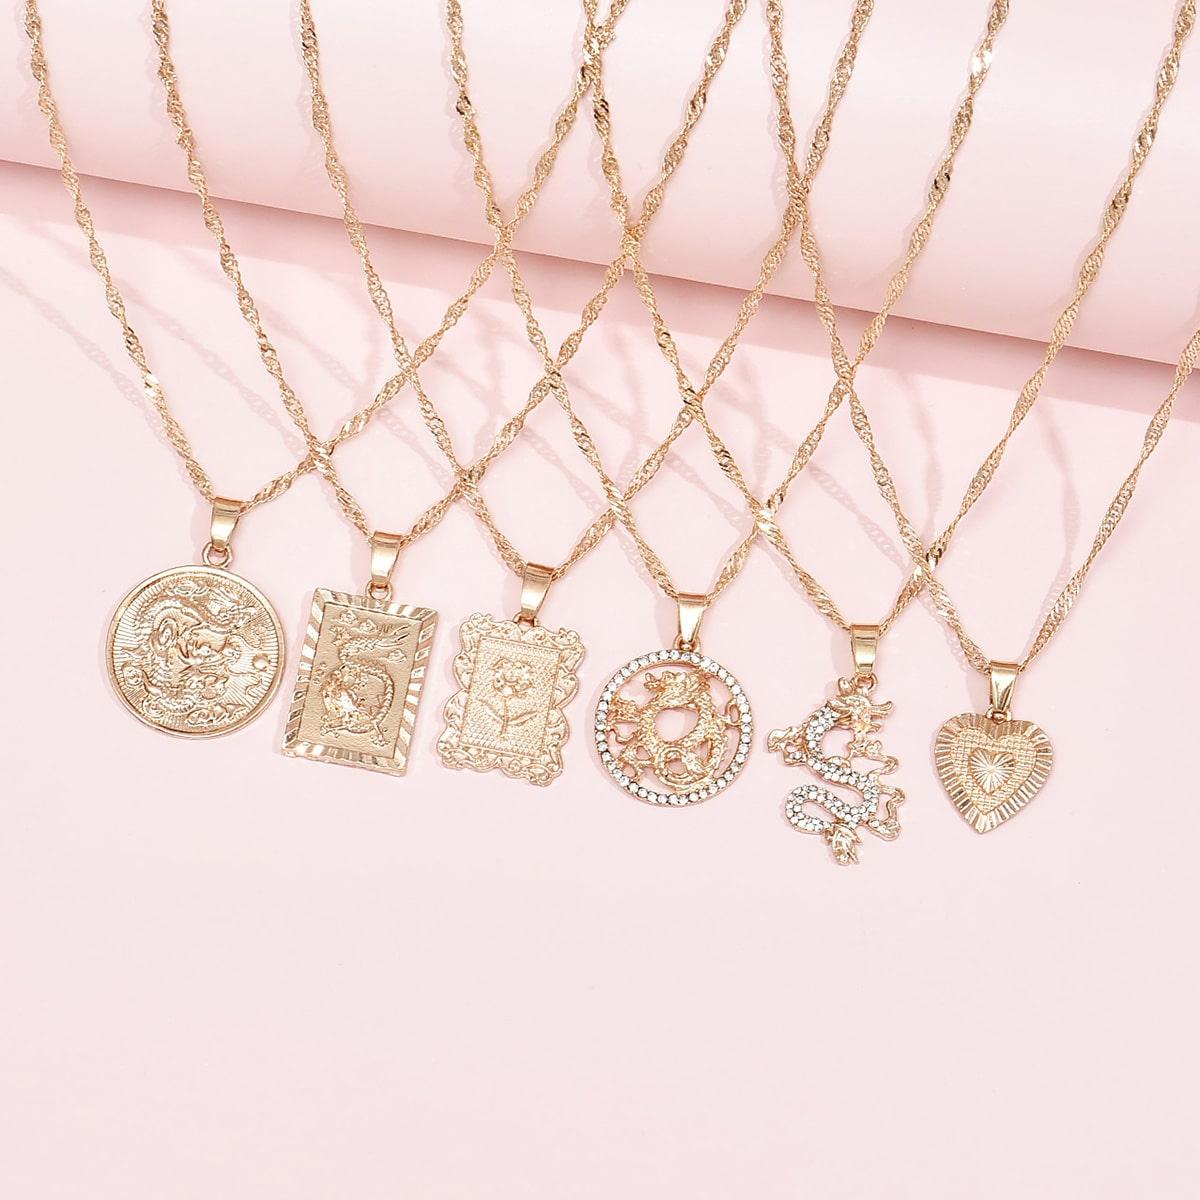 6pcs Chinese Dragon Pendant Necklace